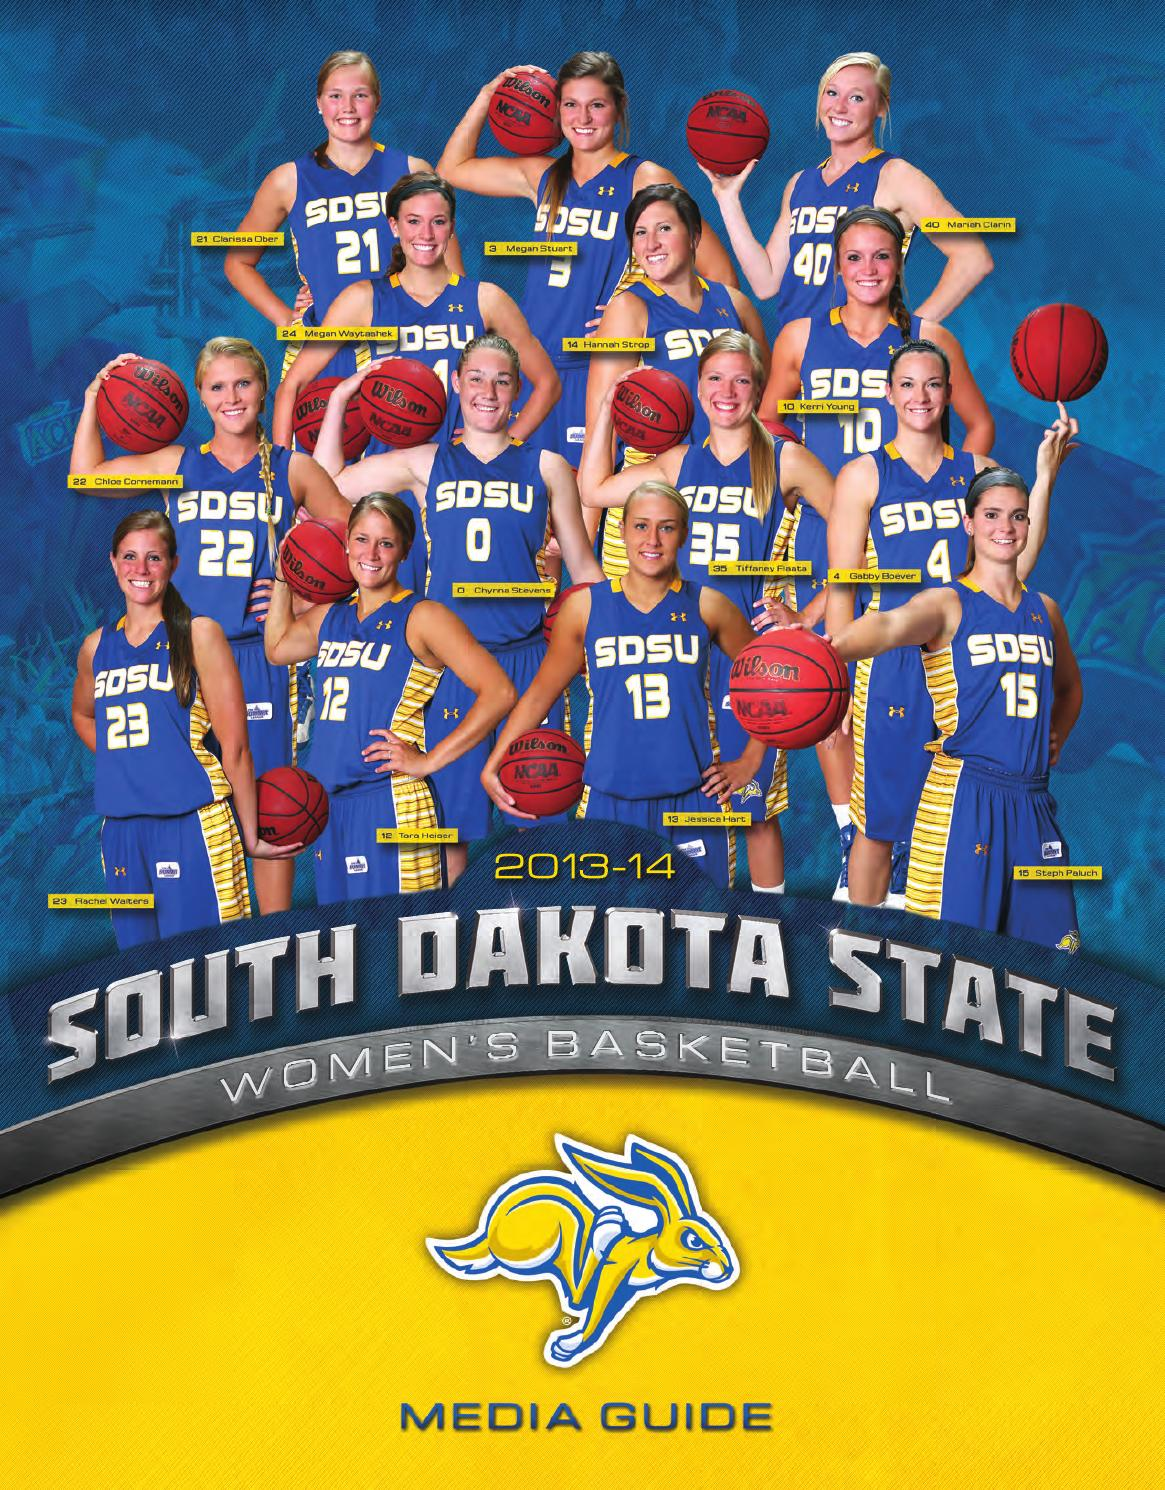 wbb media guide 13 14 by south dakota state university athletics